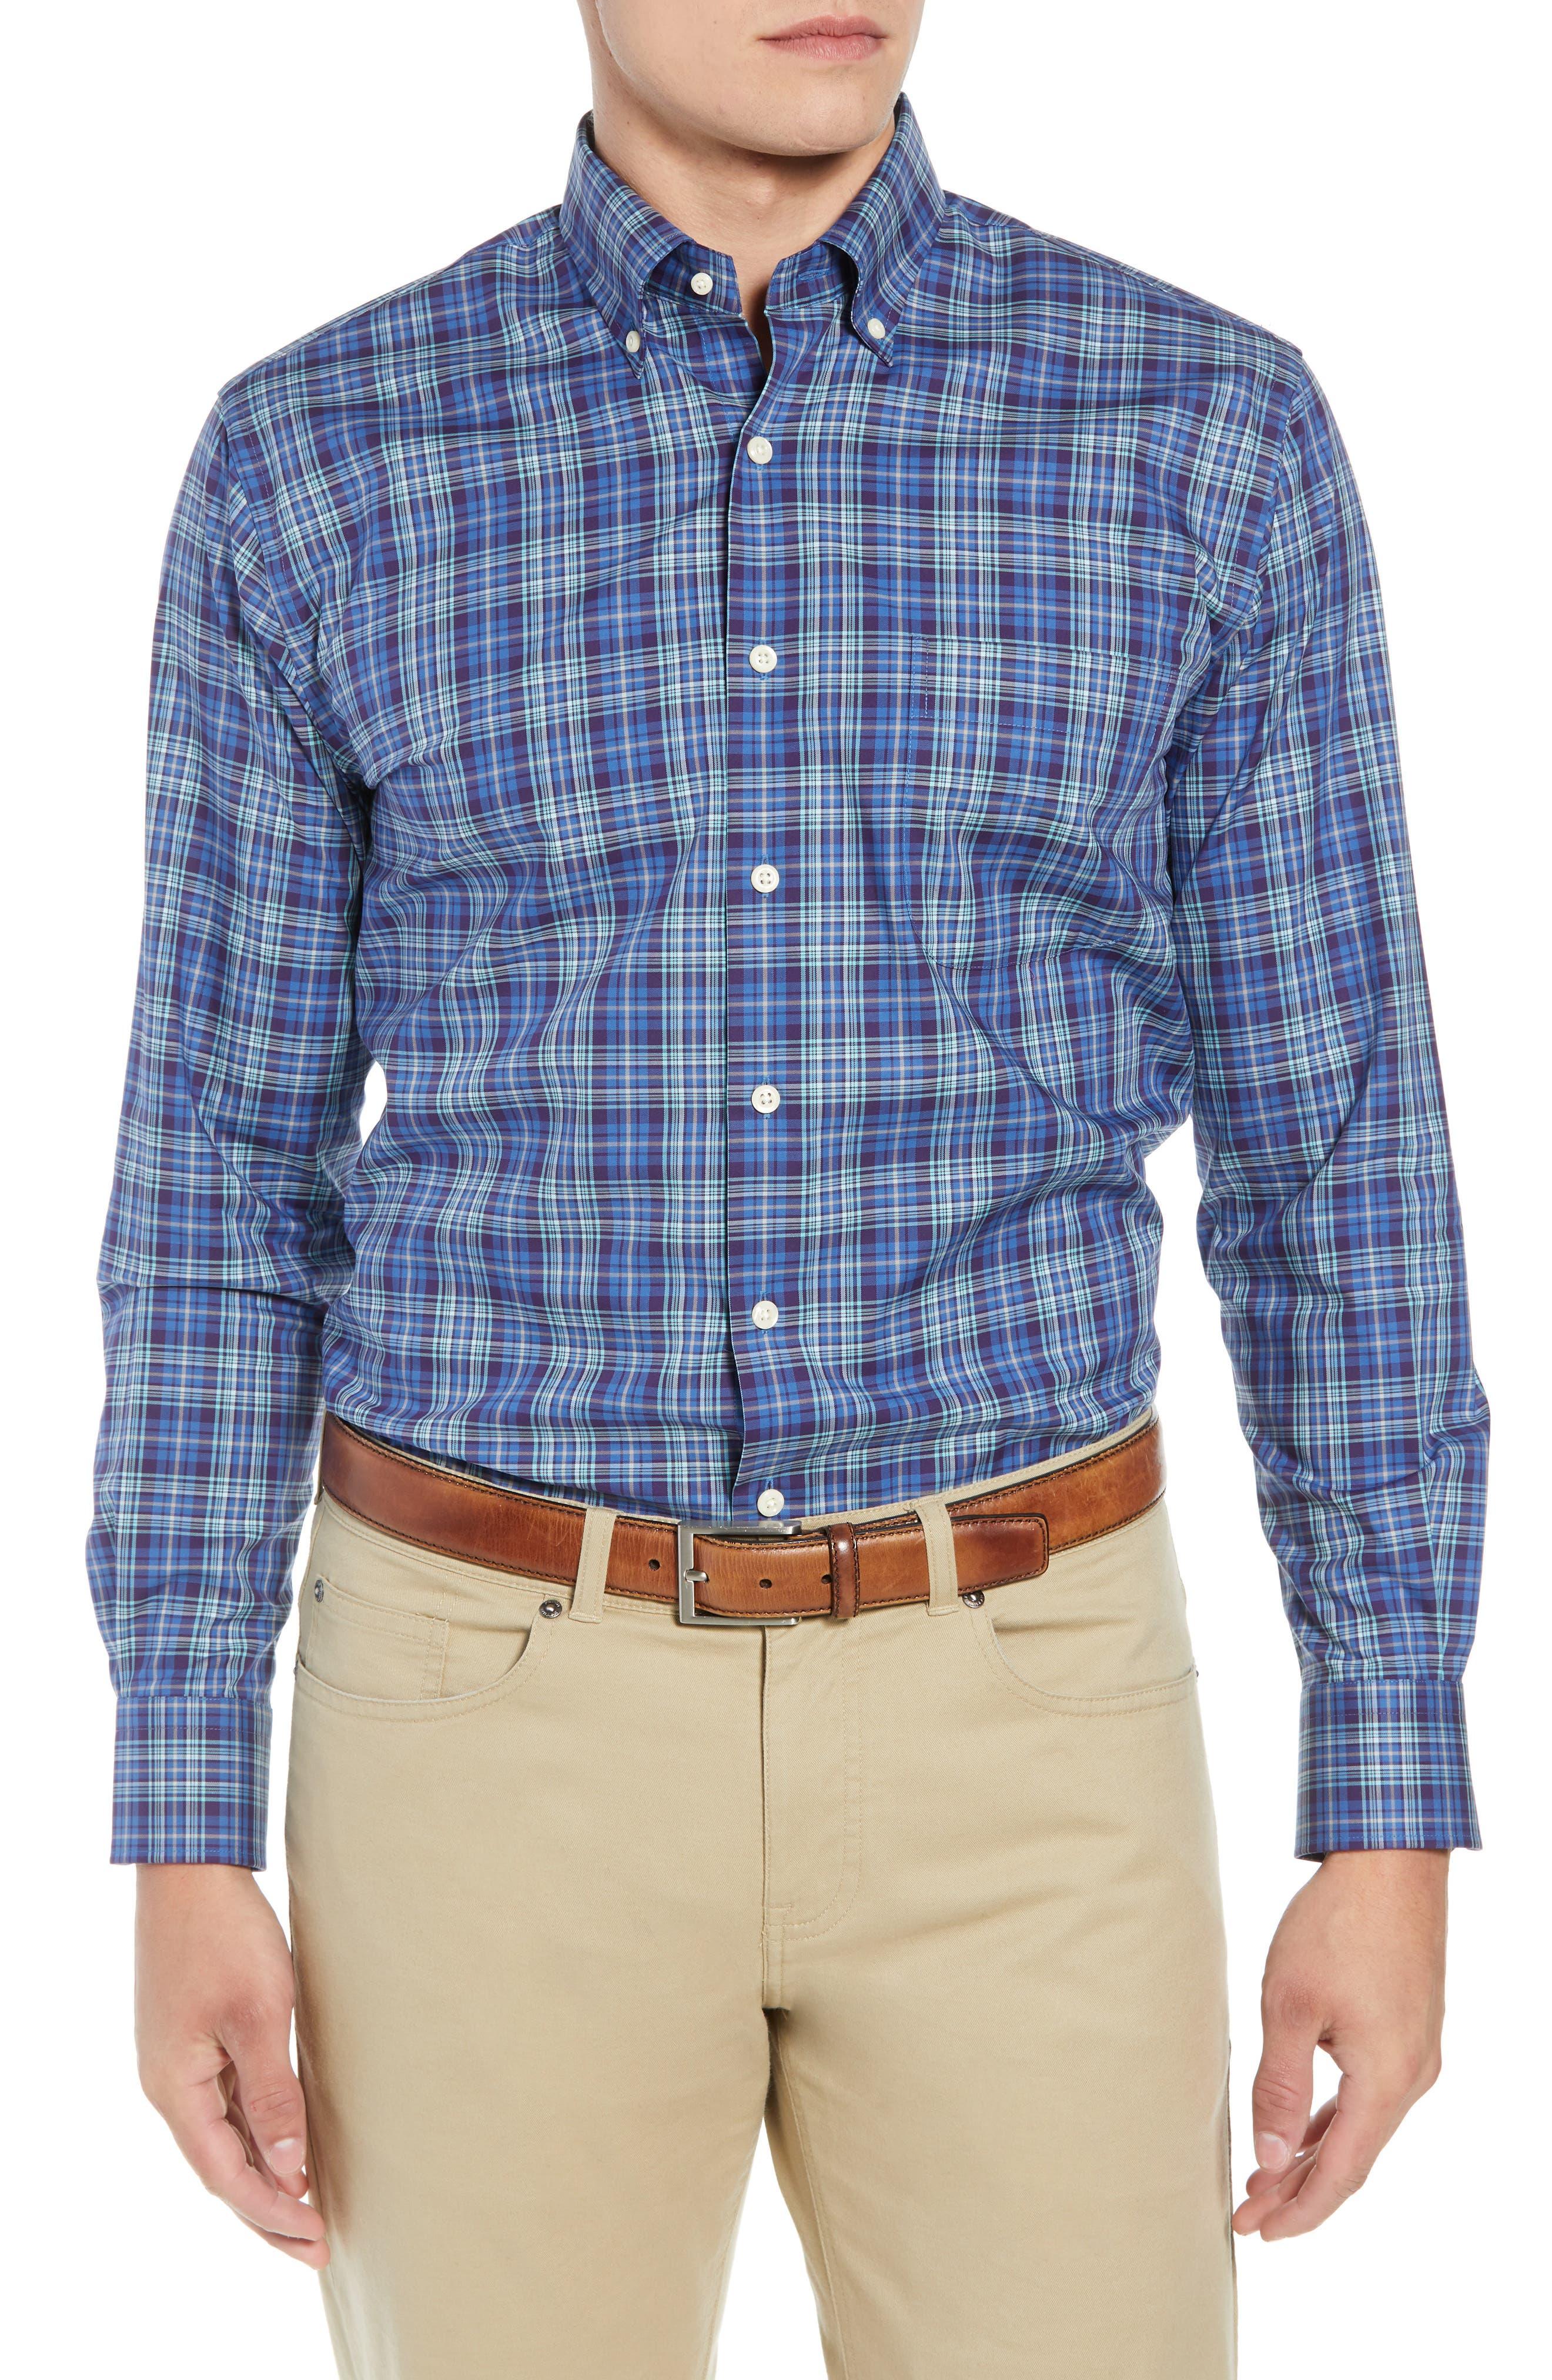 Crown Ease Flatey Island Regular Fit Tartan Plaid Sport Shirt,                             Main thumbnail 1, color,                             BLUE